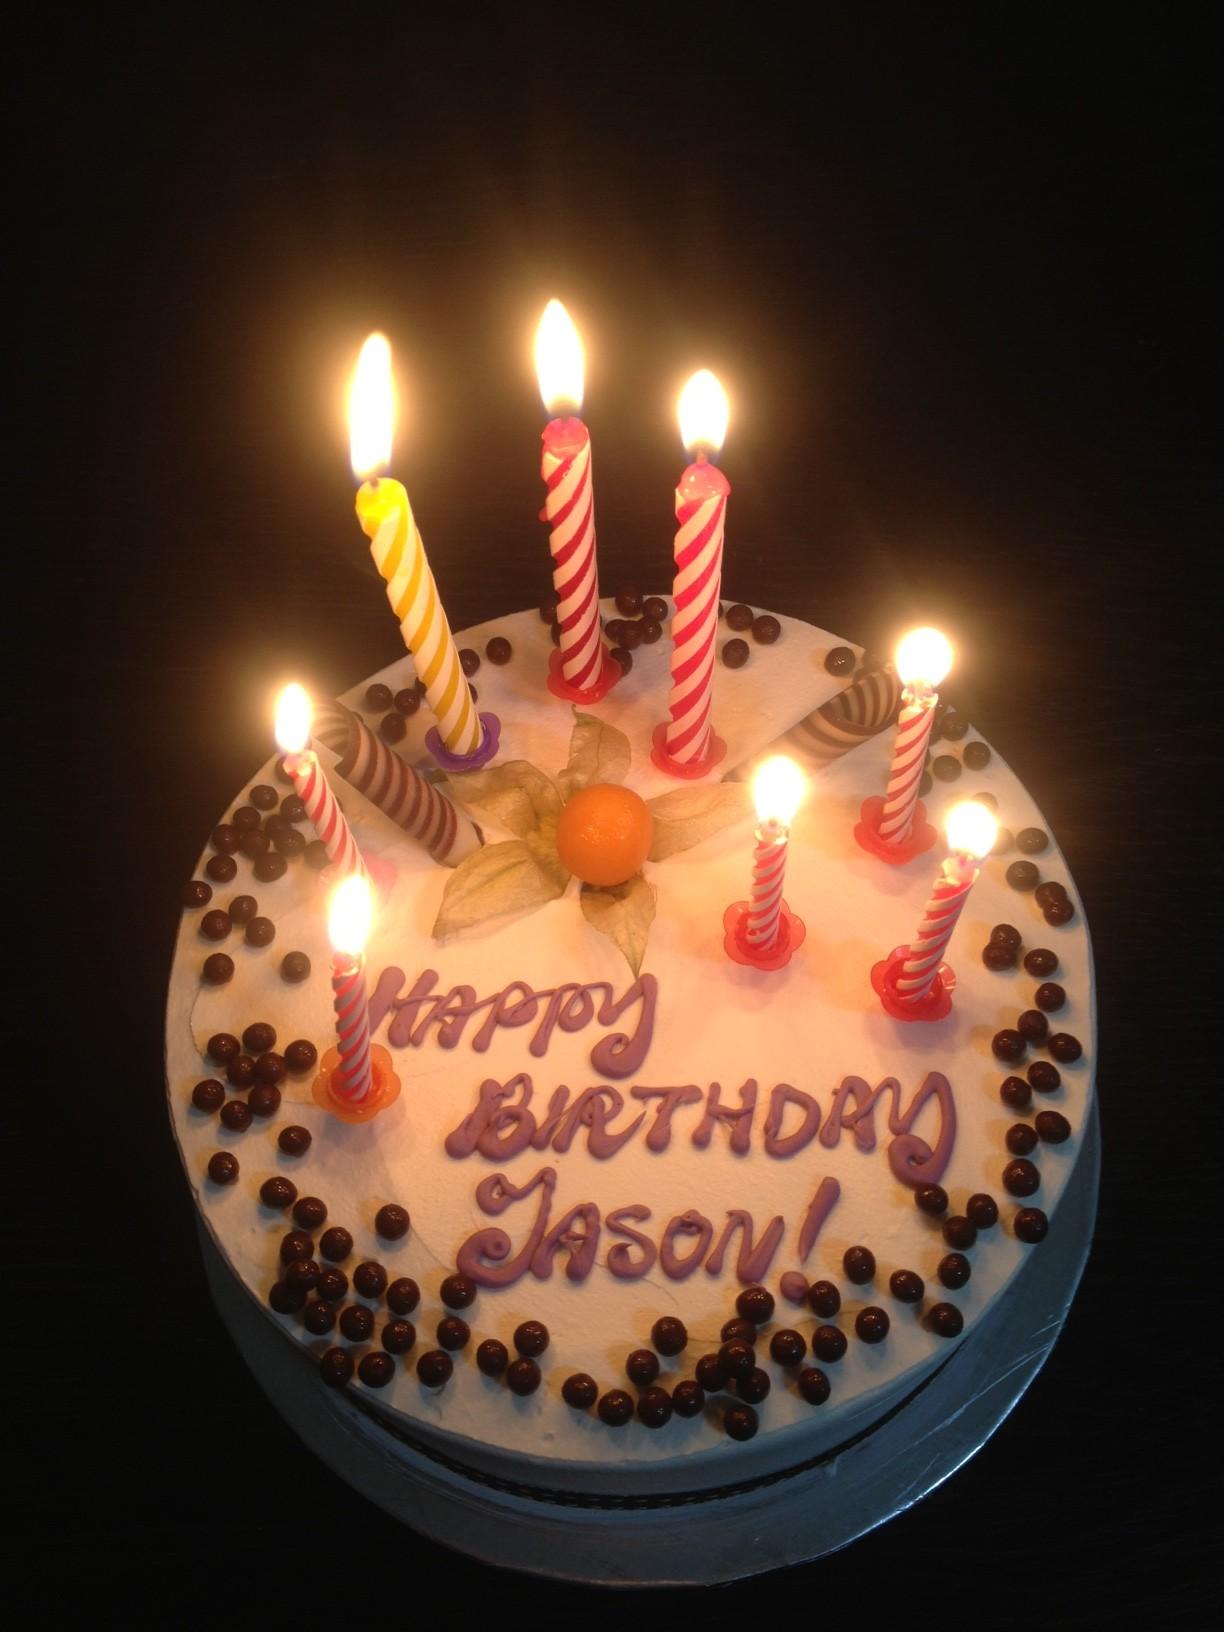 Jason Strongerhead 2013 birthday cake